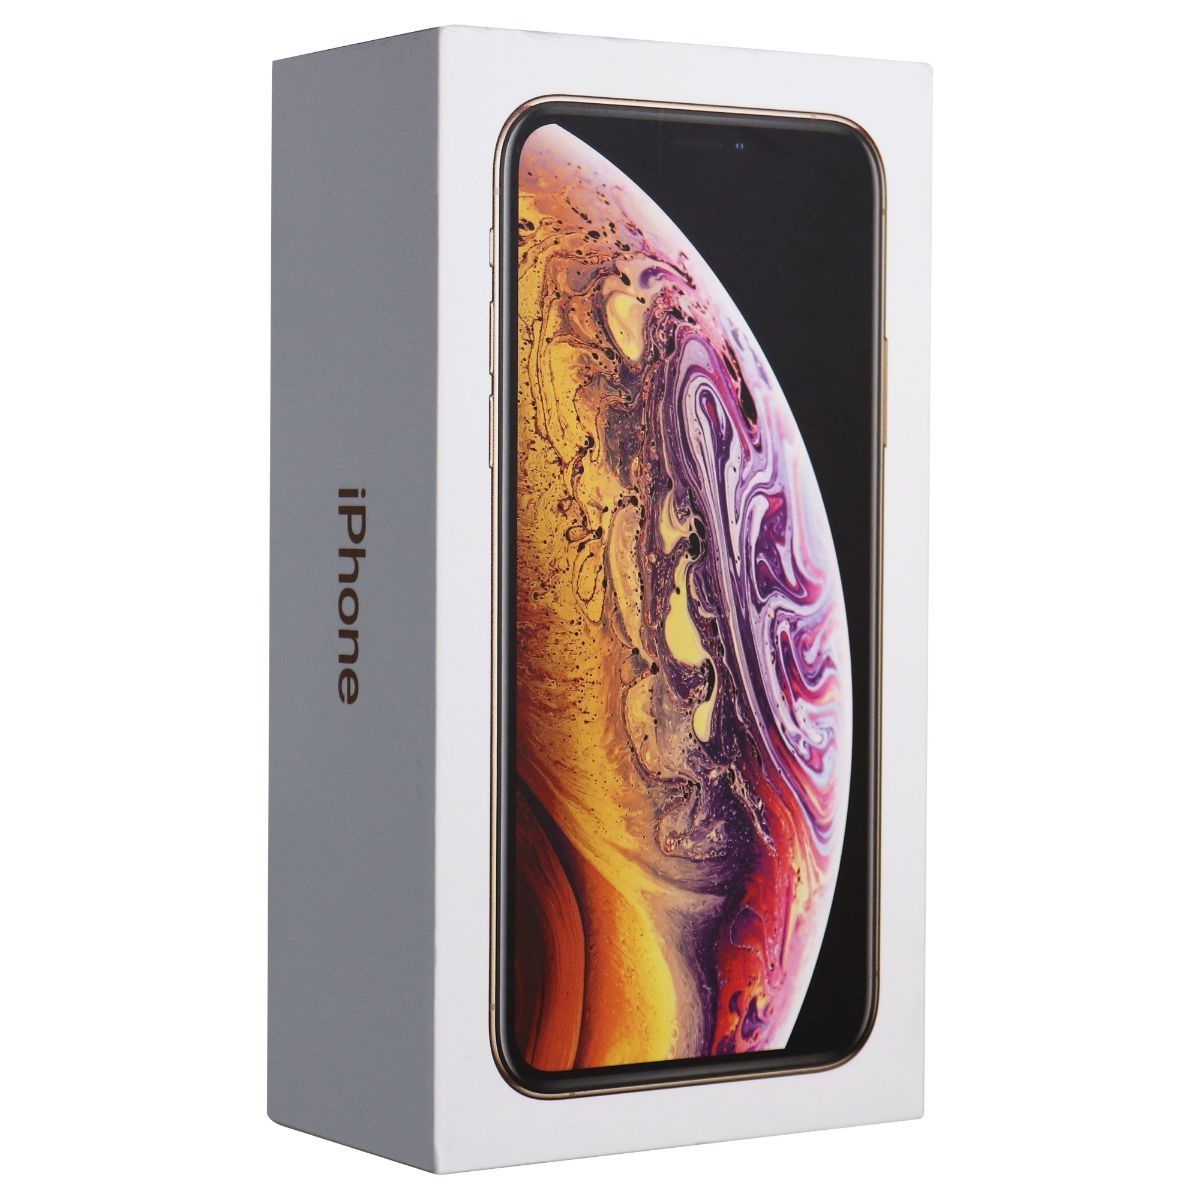 RETAIL BOX - Apple iPhone Xs - 256GB / Gold - NO DEVICE